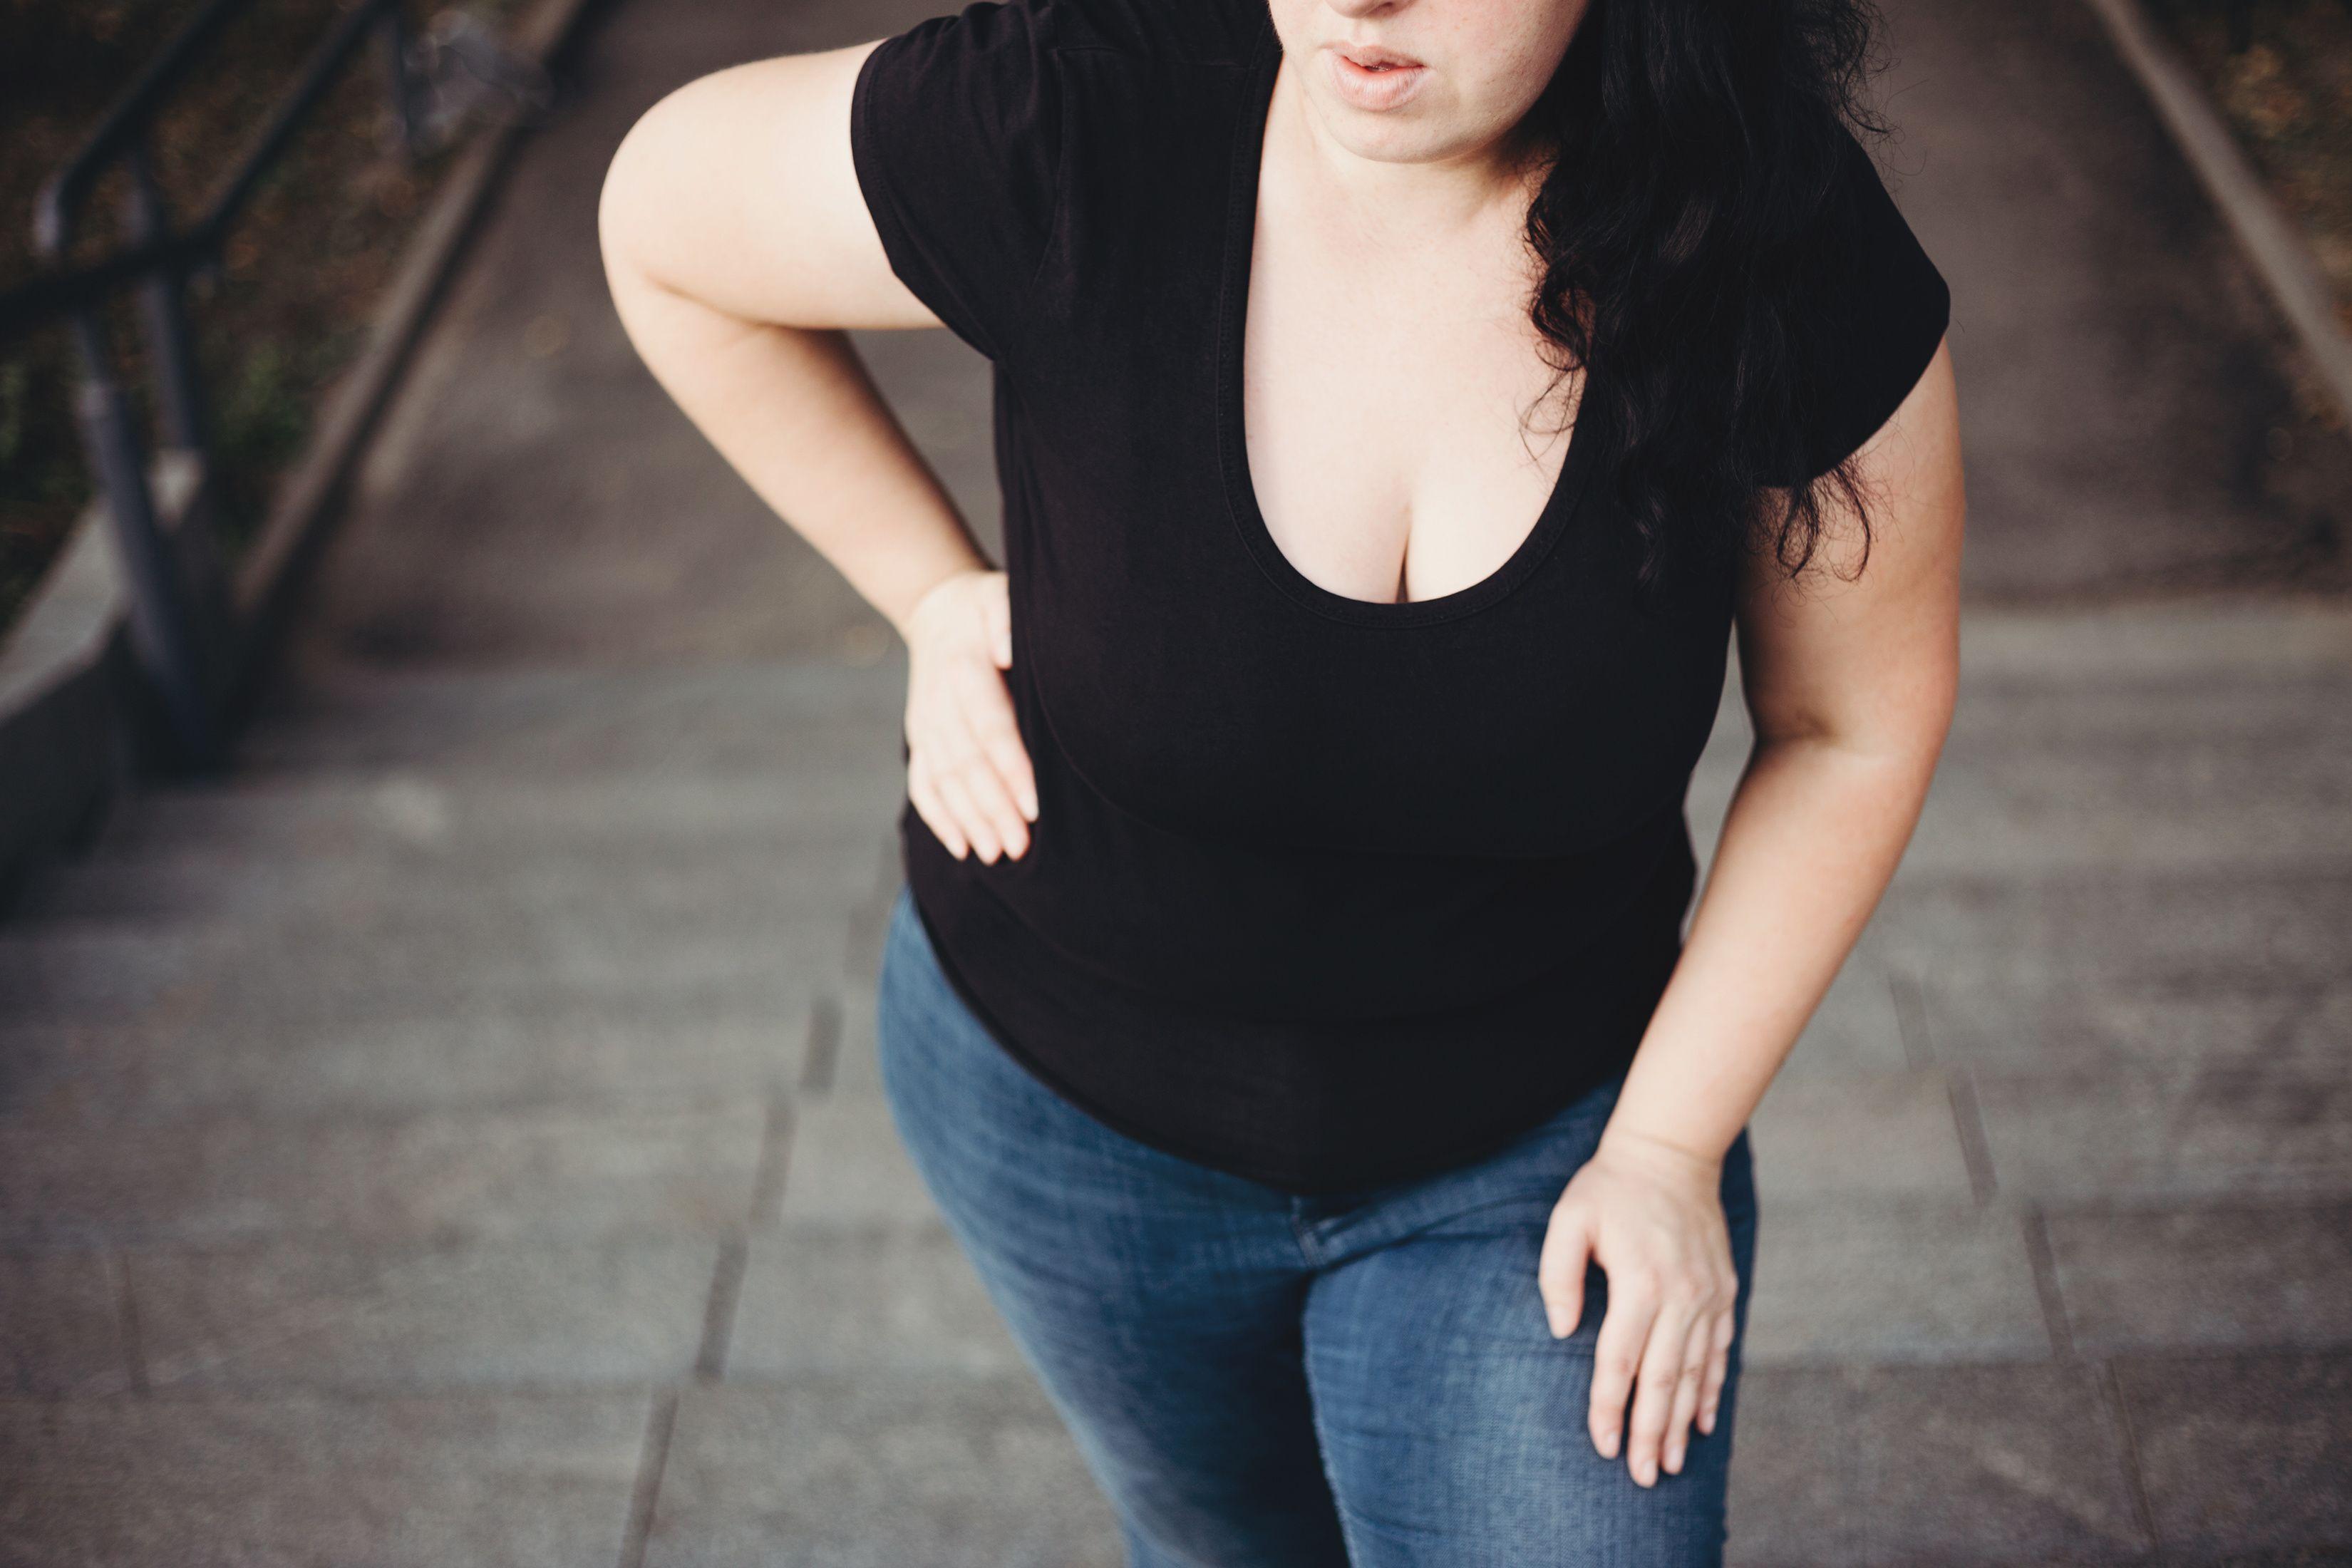 HIGH BMI ASSOCIATED WITH PSORIATIC ARTHRITIS AND RHEUMATOID ARTHRITIS: